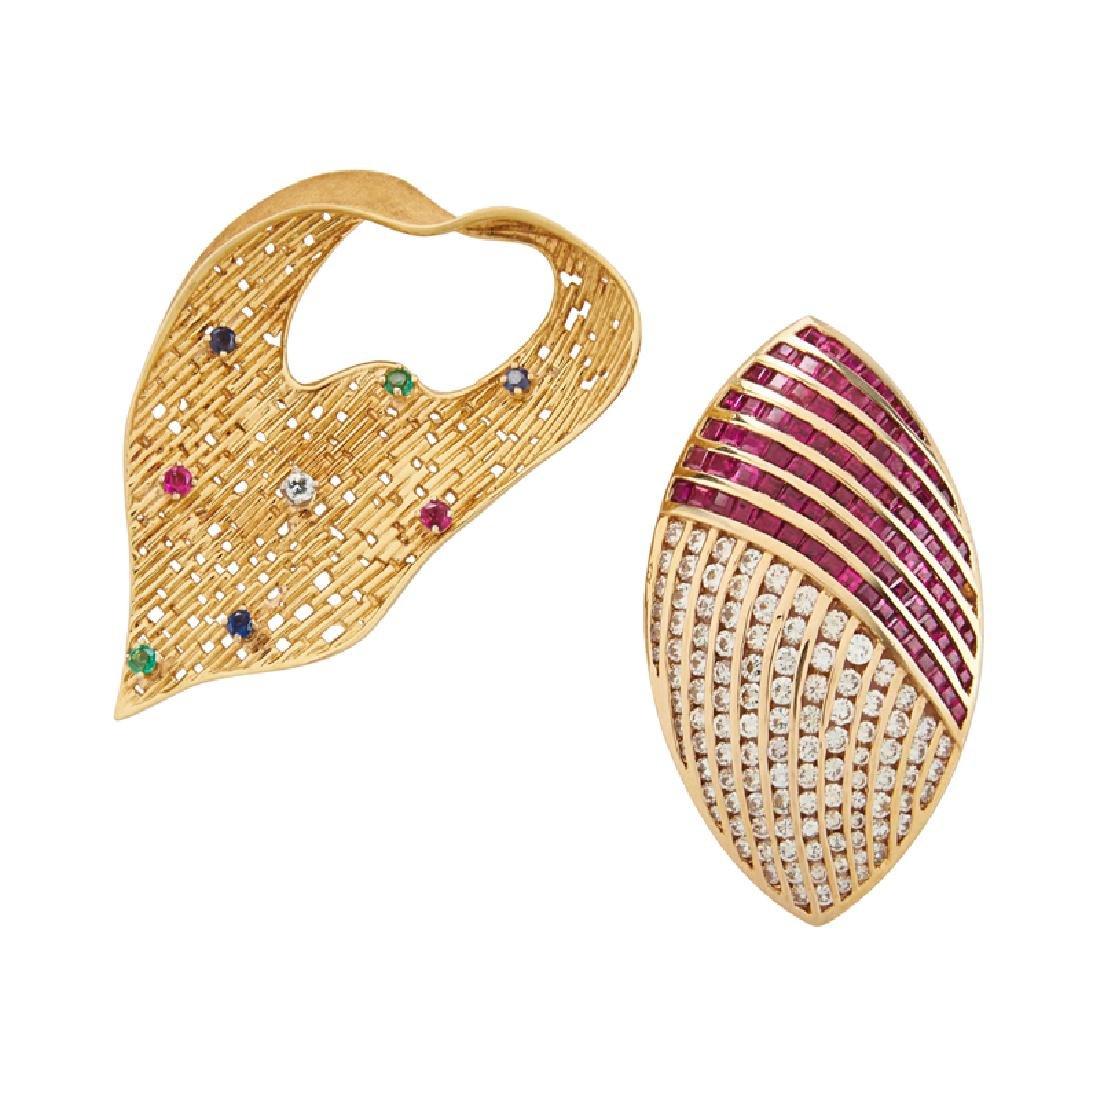 RETRO DIAMOND & GEM-SET YELLOW GOLD PENDANT BROOCHES